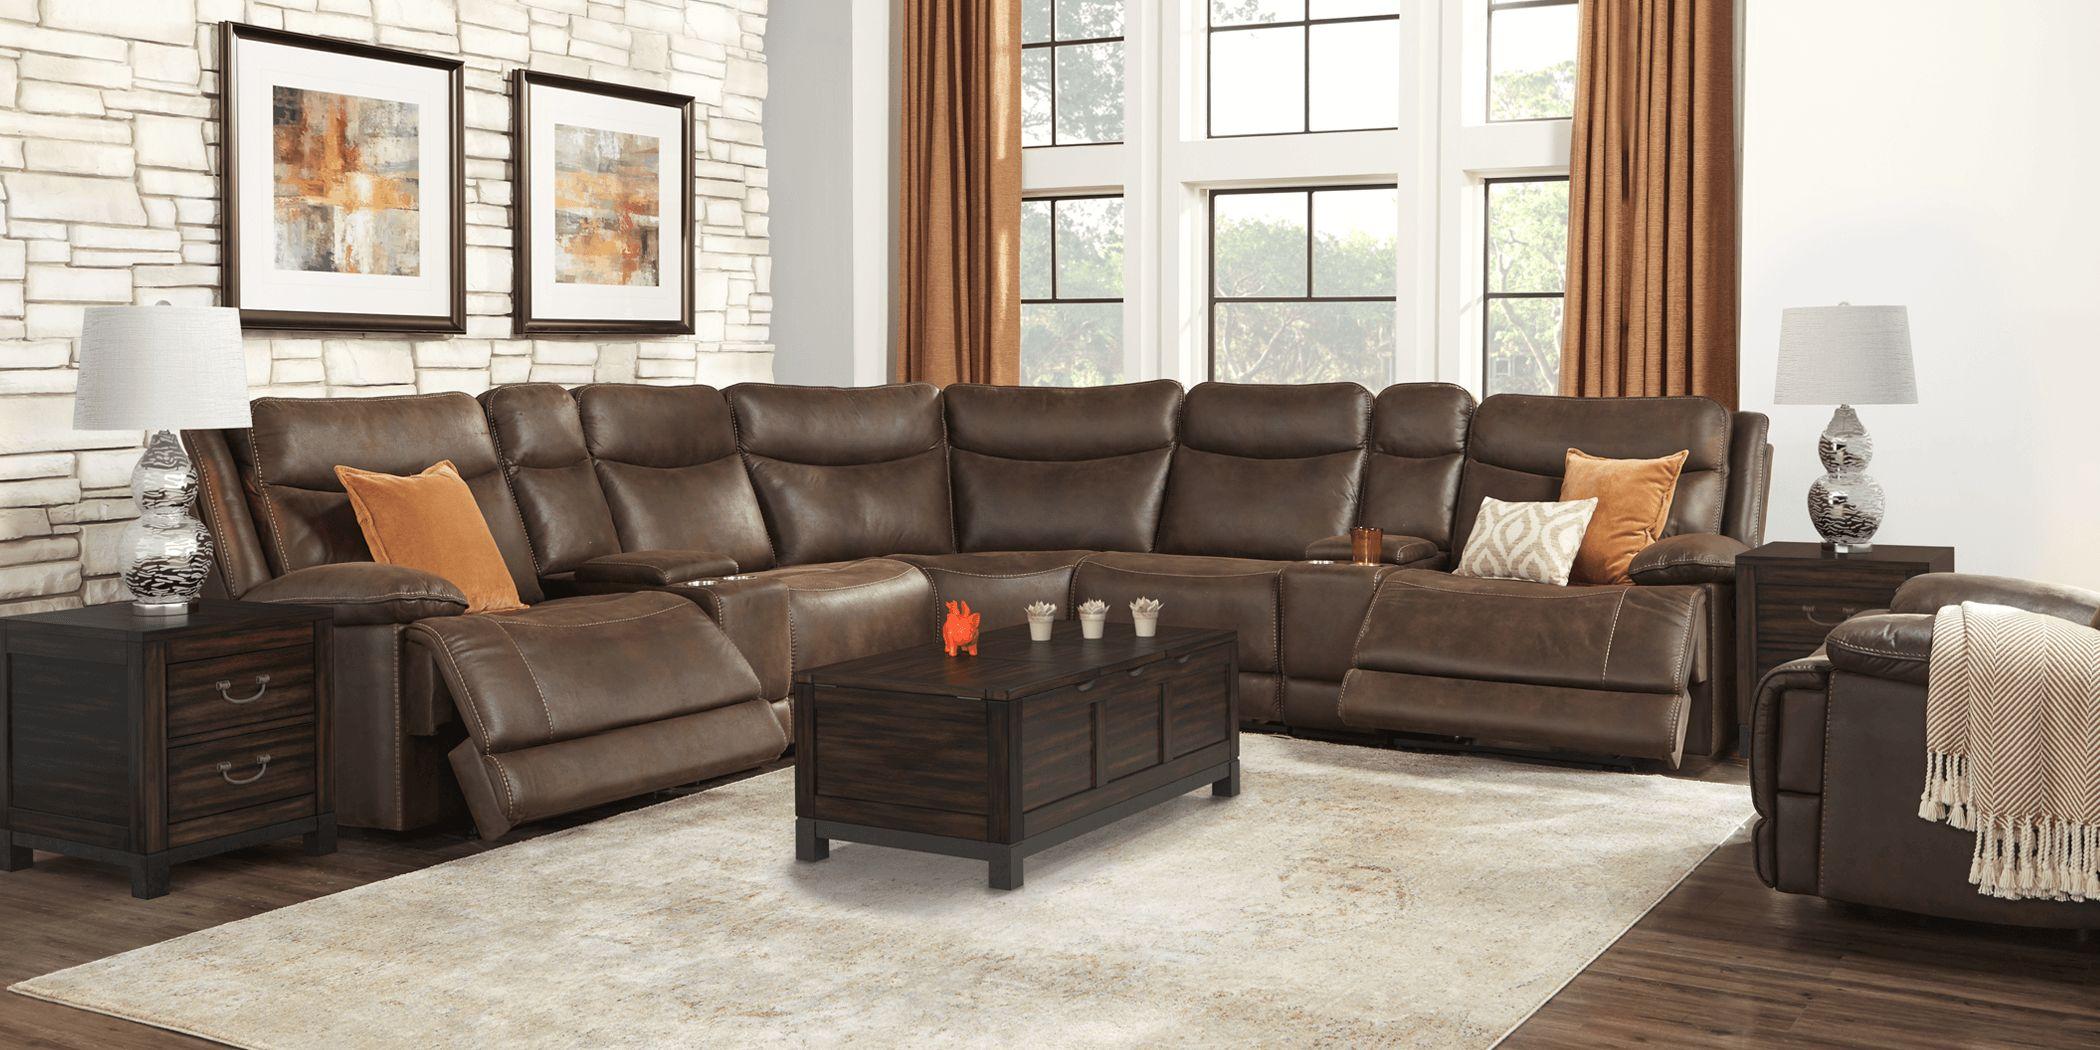 Calverton Chocolate 9 Pc Power Reclining Sectional Living Room